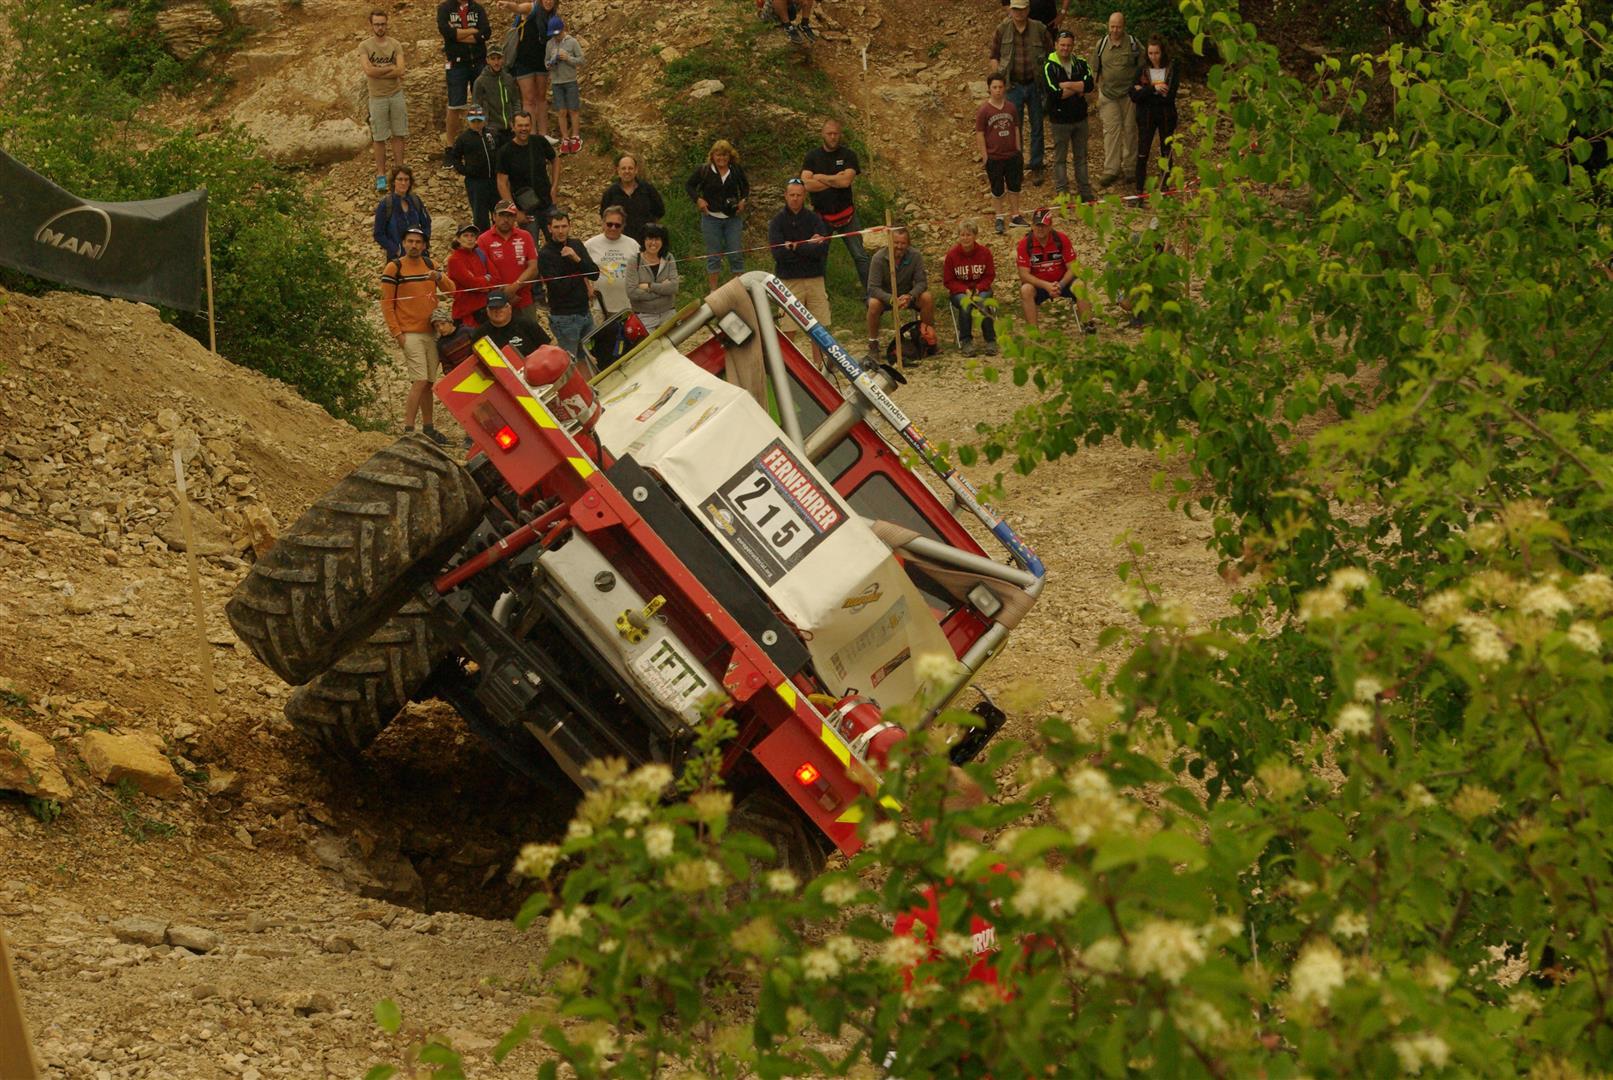 Truck Trial Montalieu 2018 Imgp7019